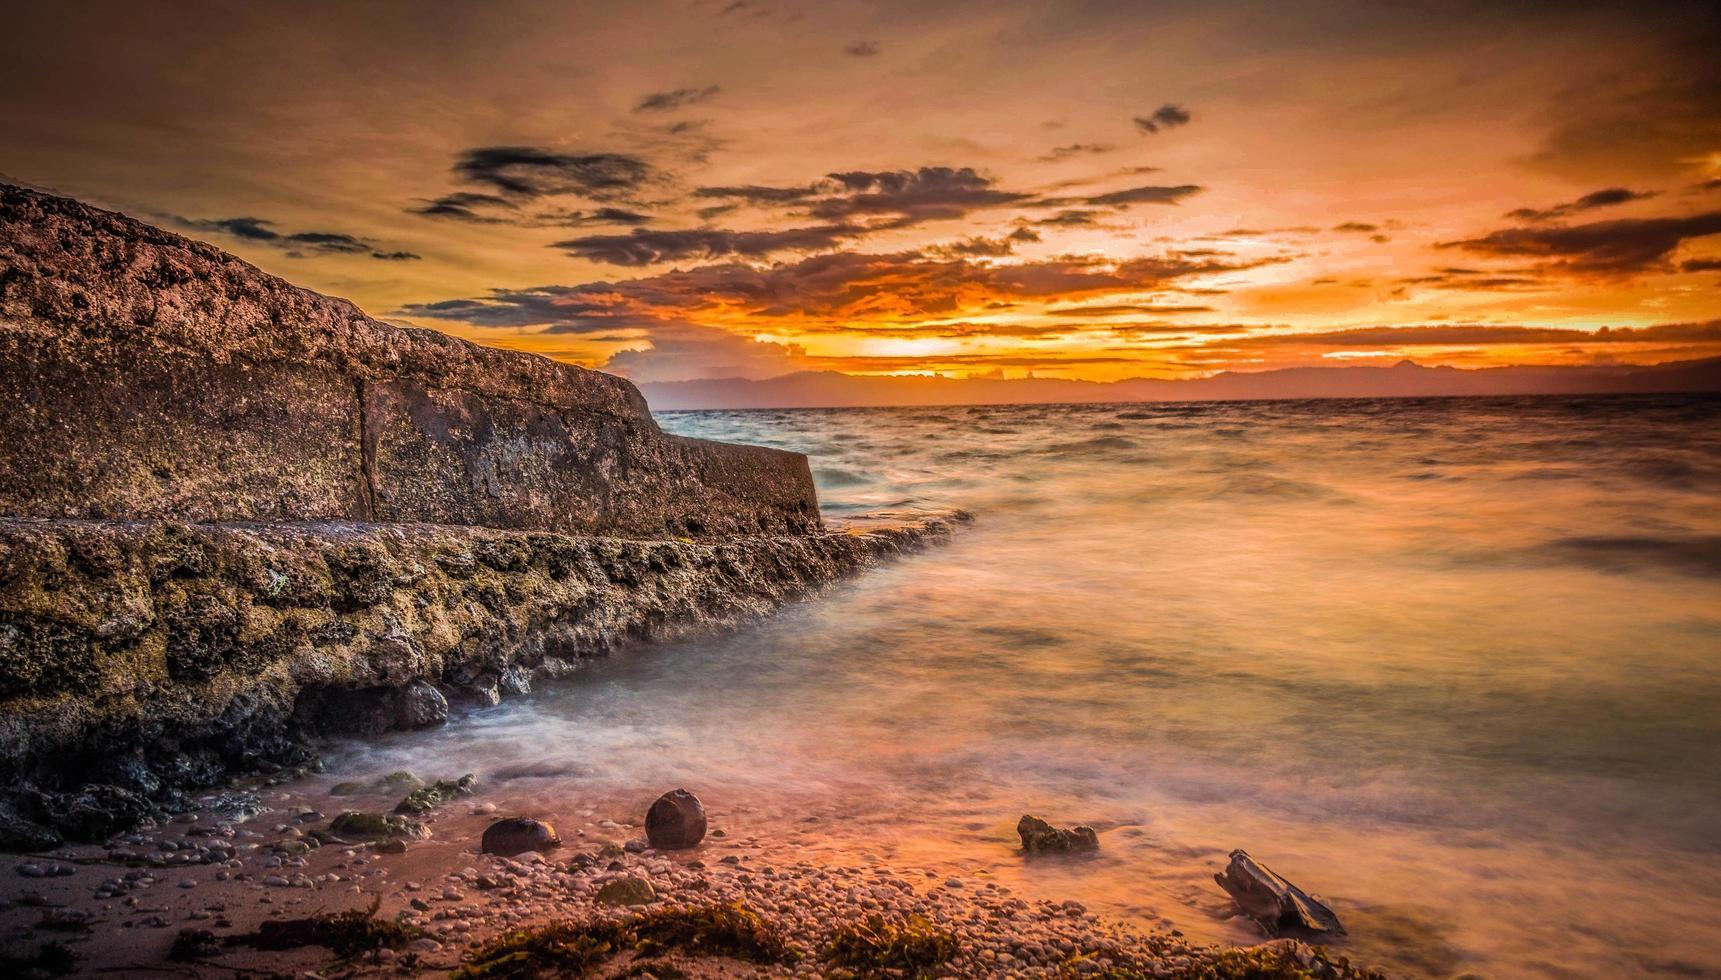 Meer während des Sonnenuntergangs foto